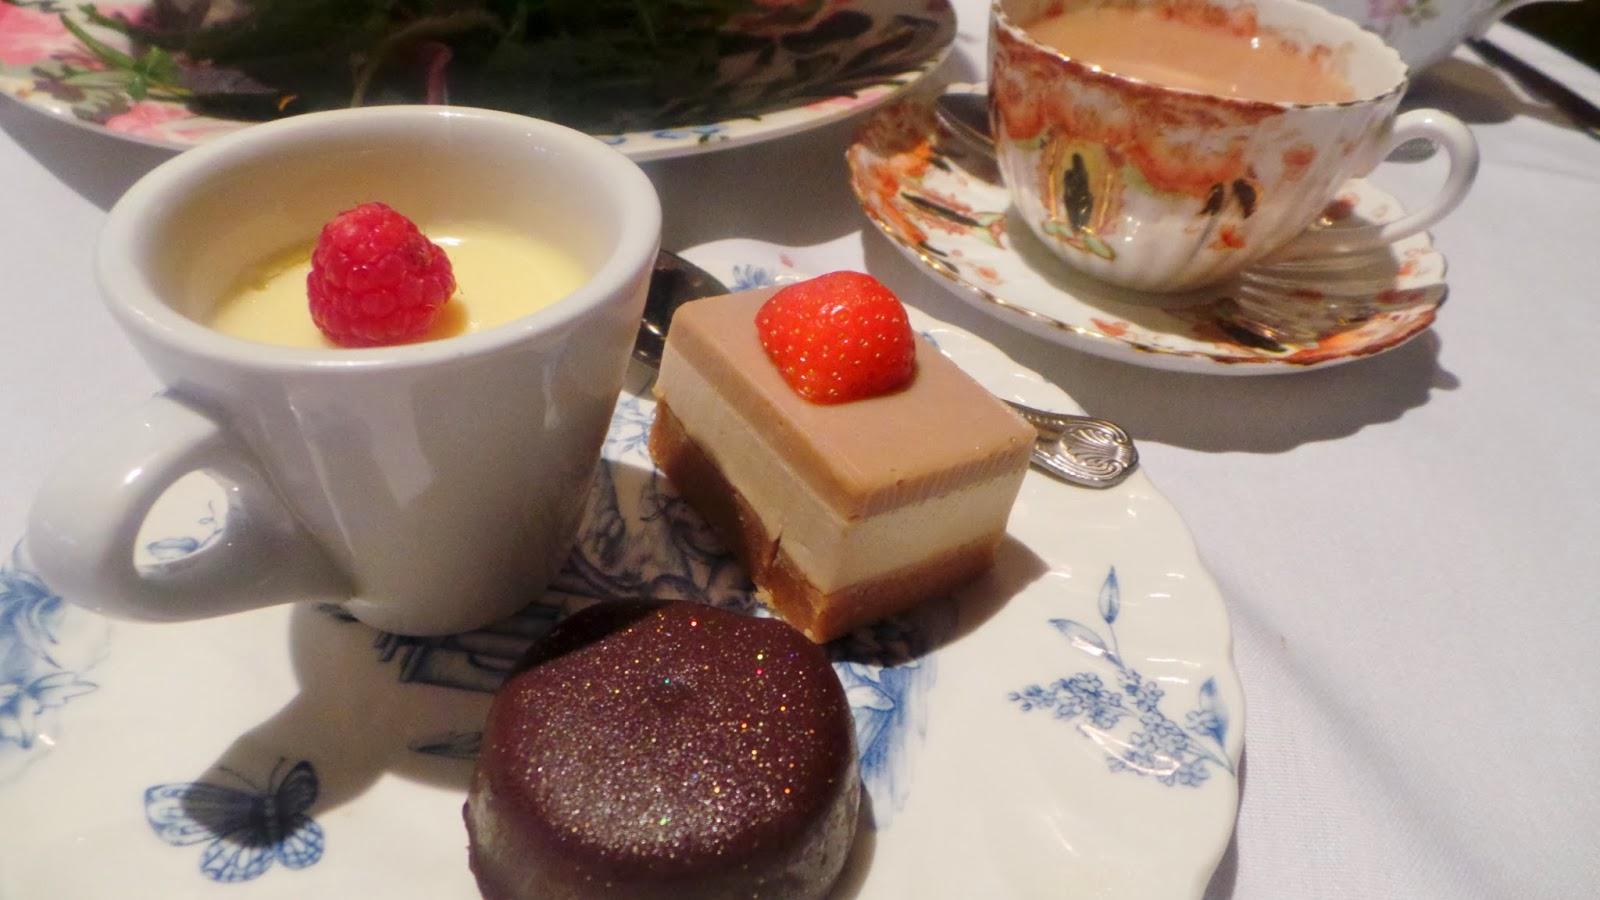 Holdsworth House afternoon tea cakes